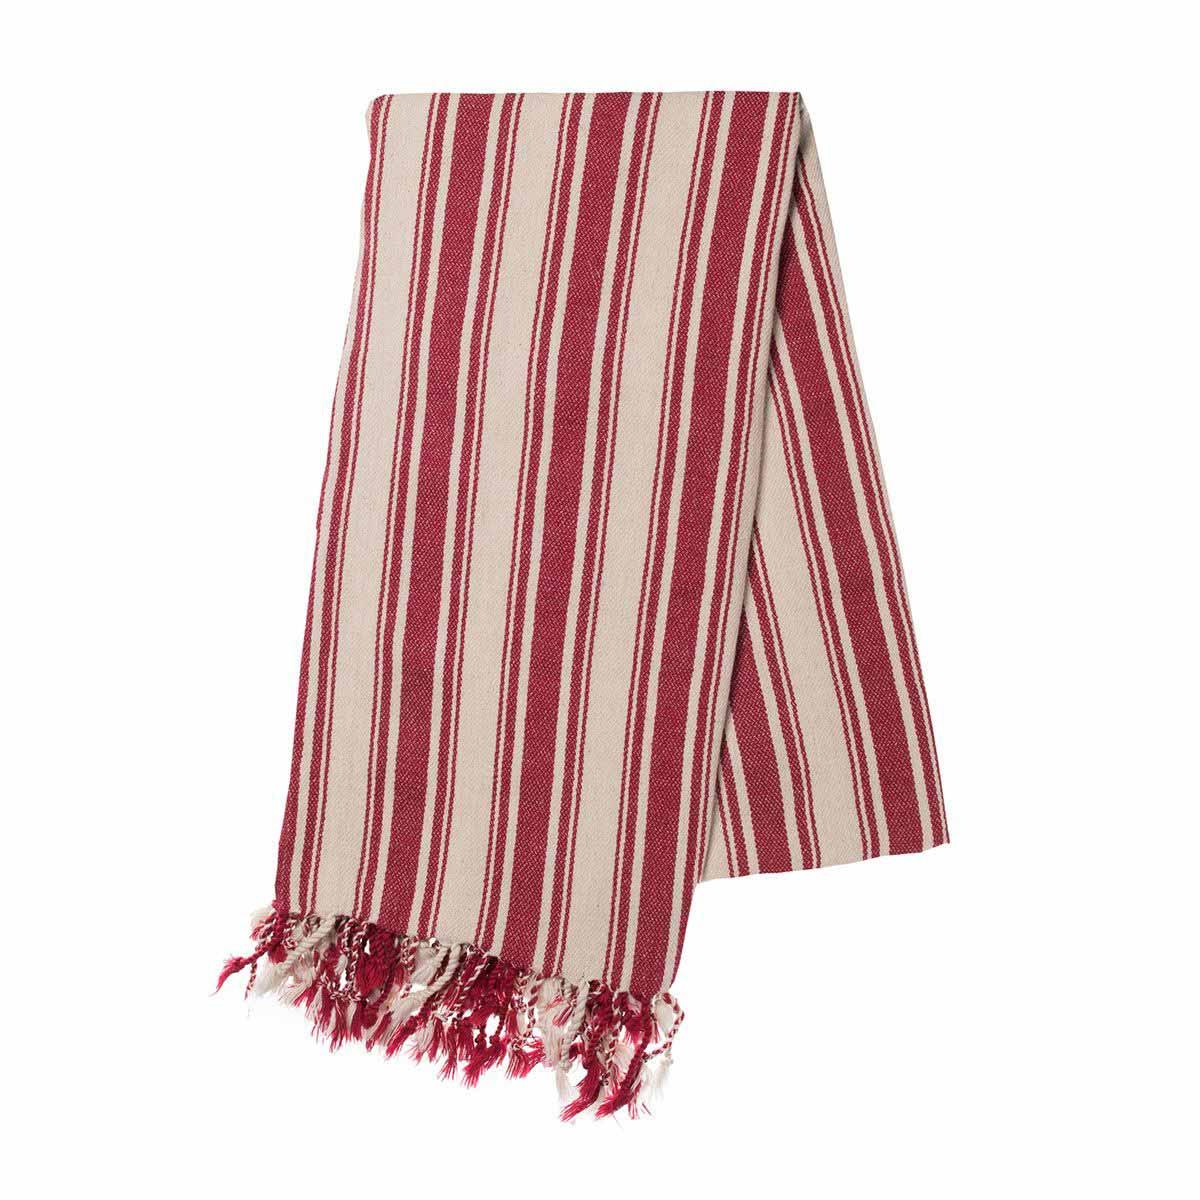 Buldano Turkish Towel - Verti Stripes Red